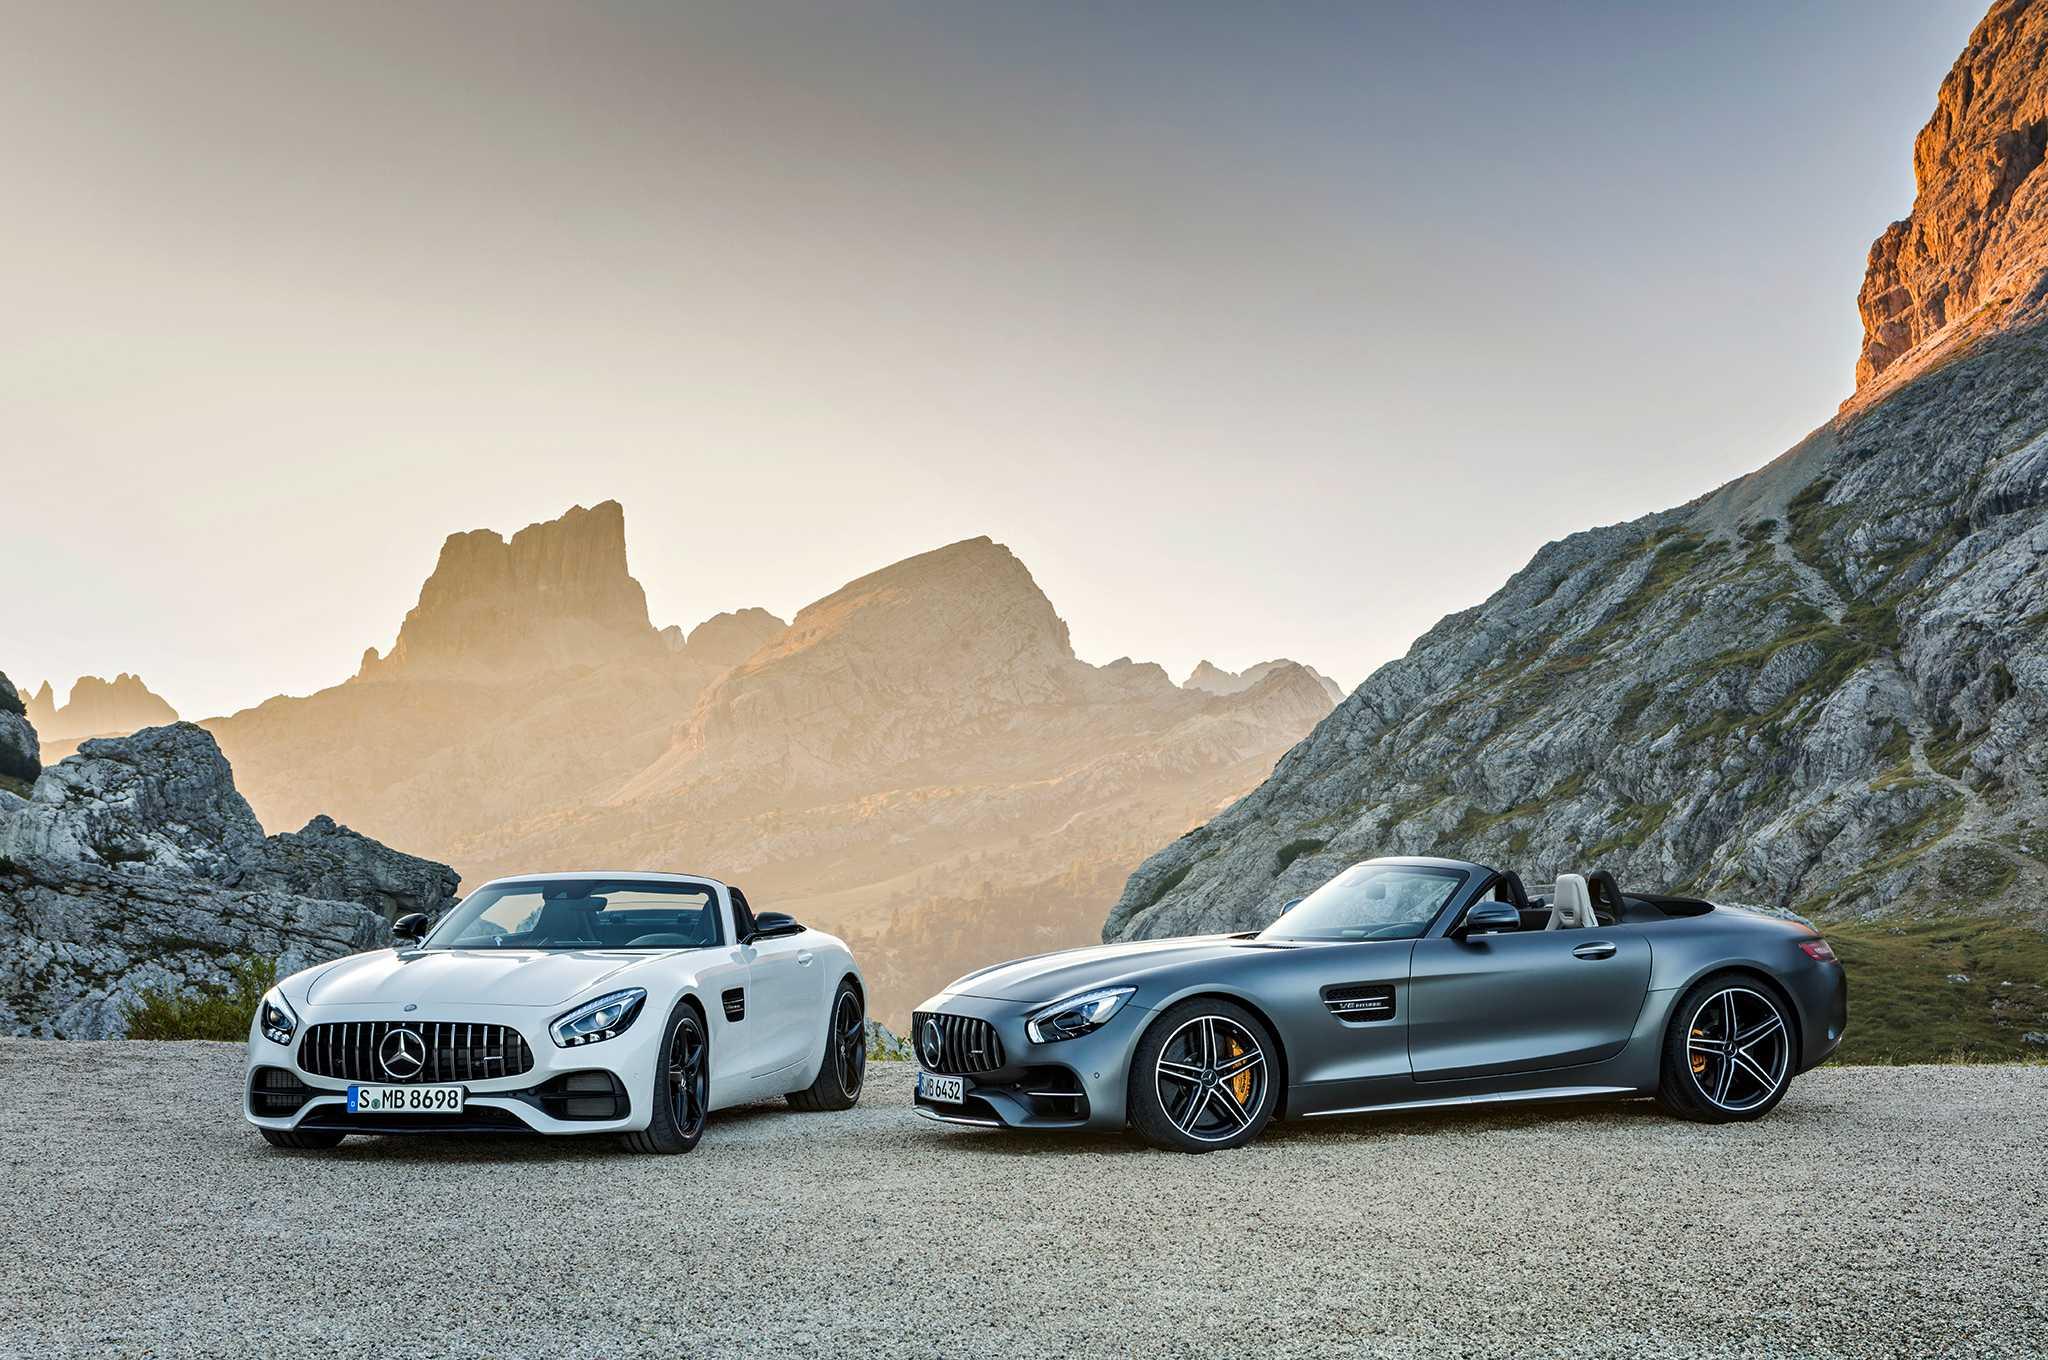 Mercedes AMG GT C, GT Roadster Photos, Specs Revealed Ahead of Paris Show